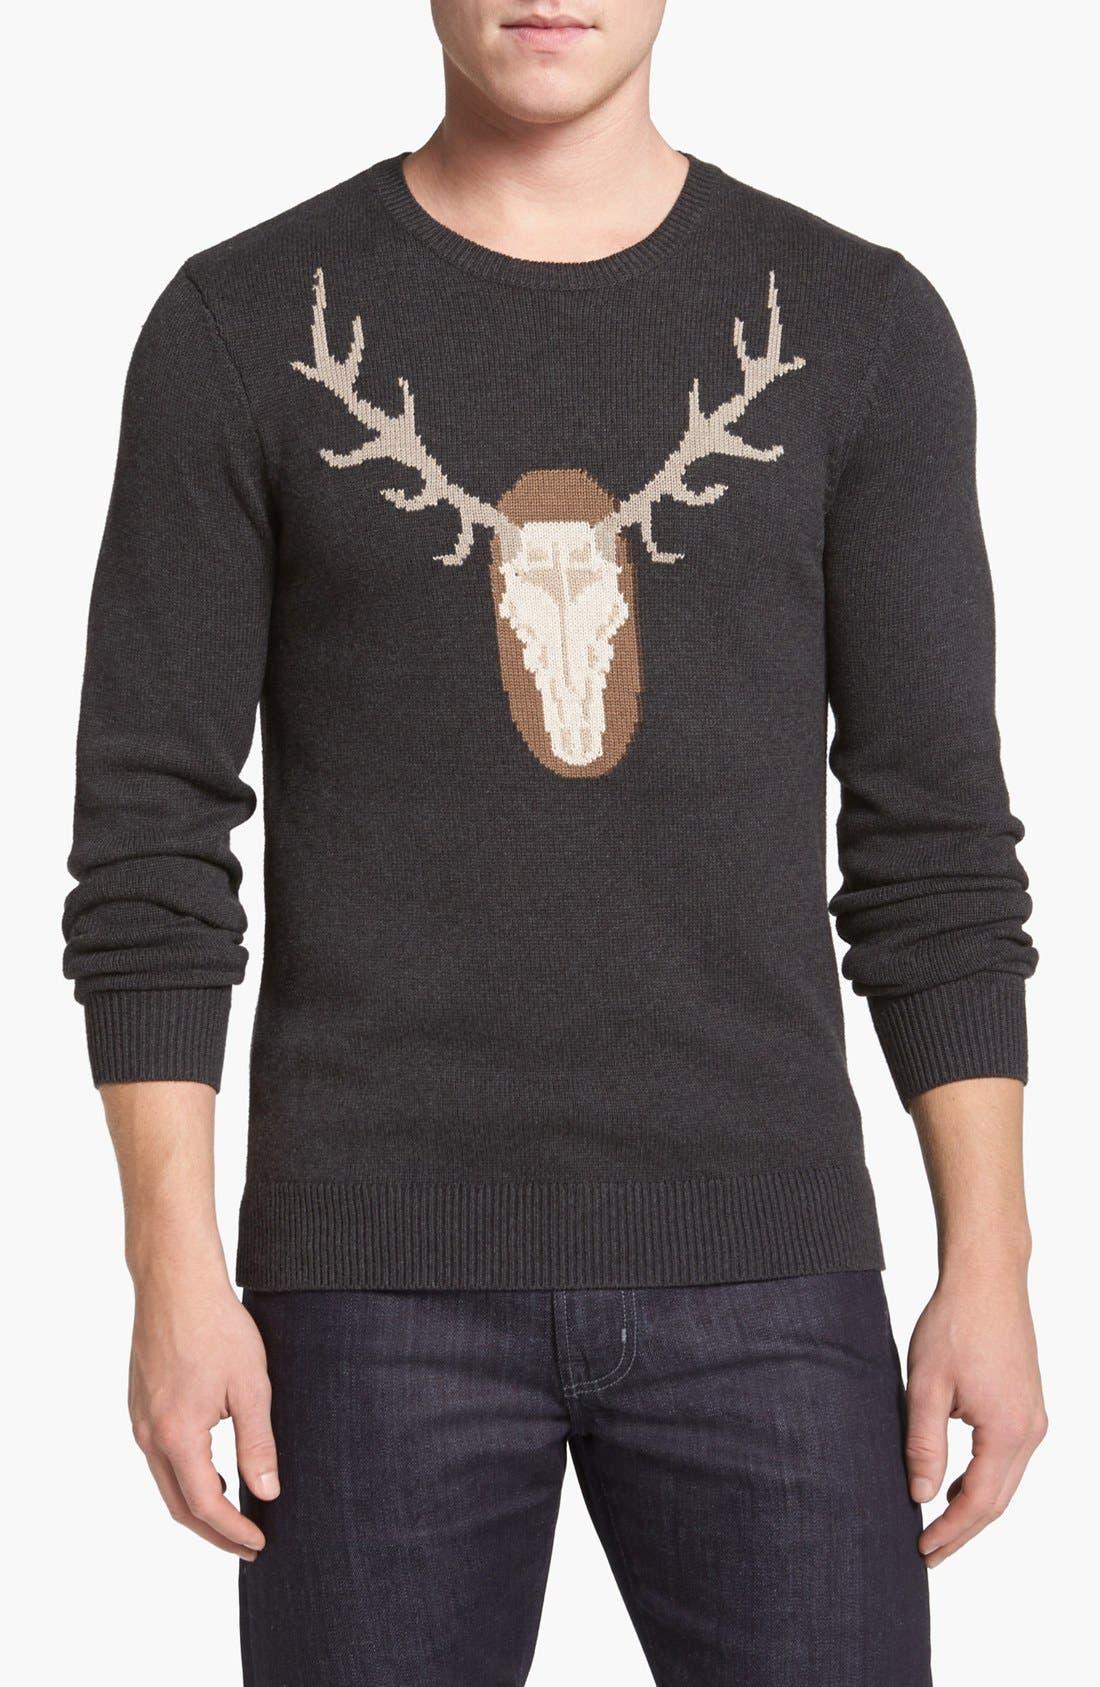 Alternate Image 1 Selected - 1901 Graphic Crewneck Sweater